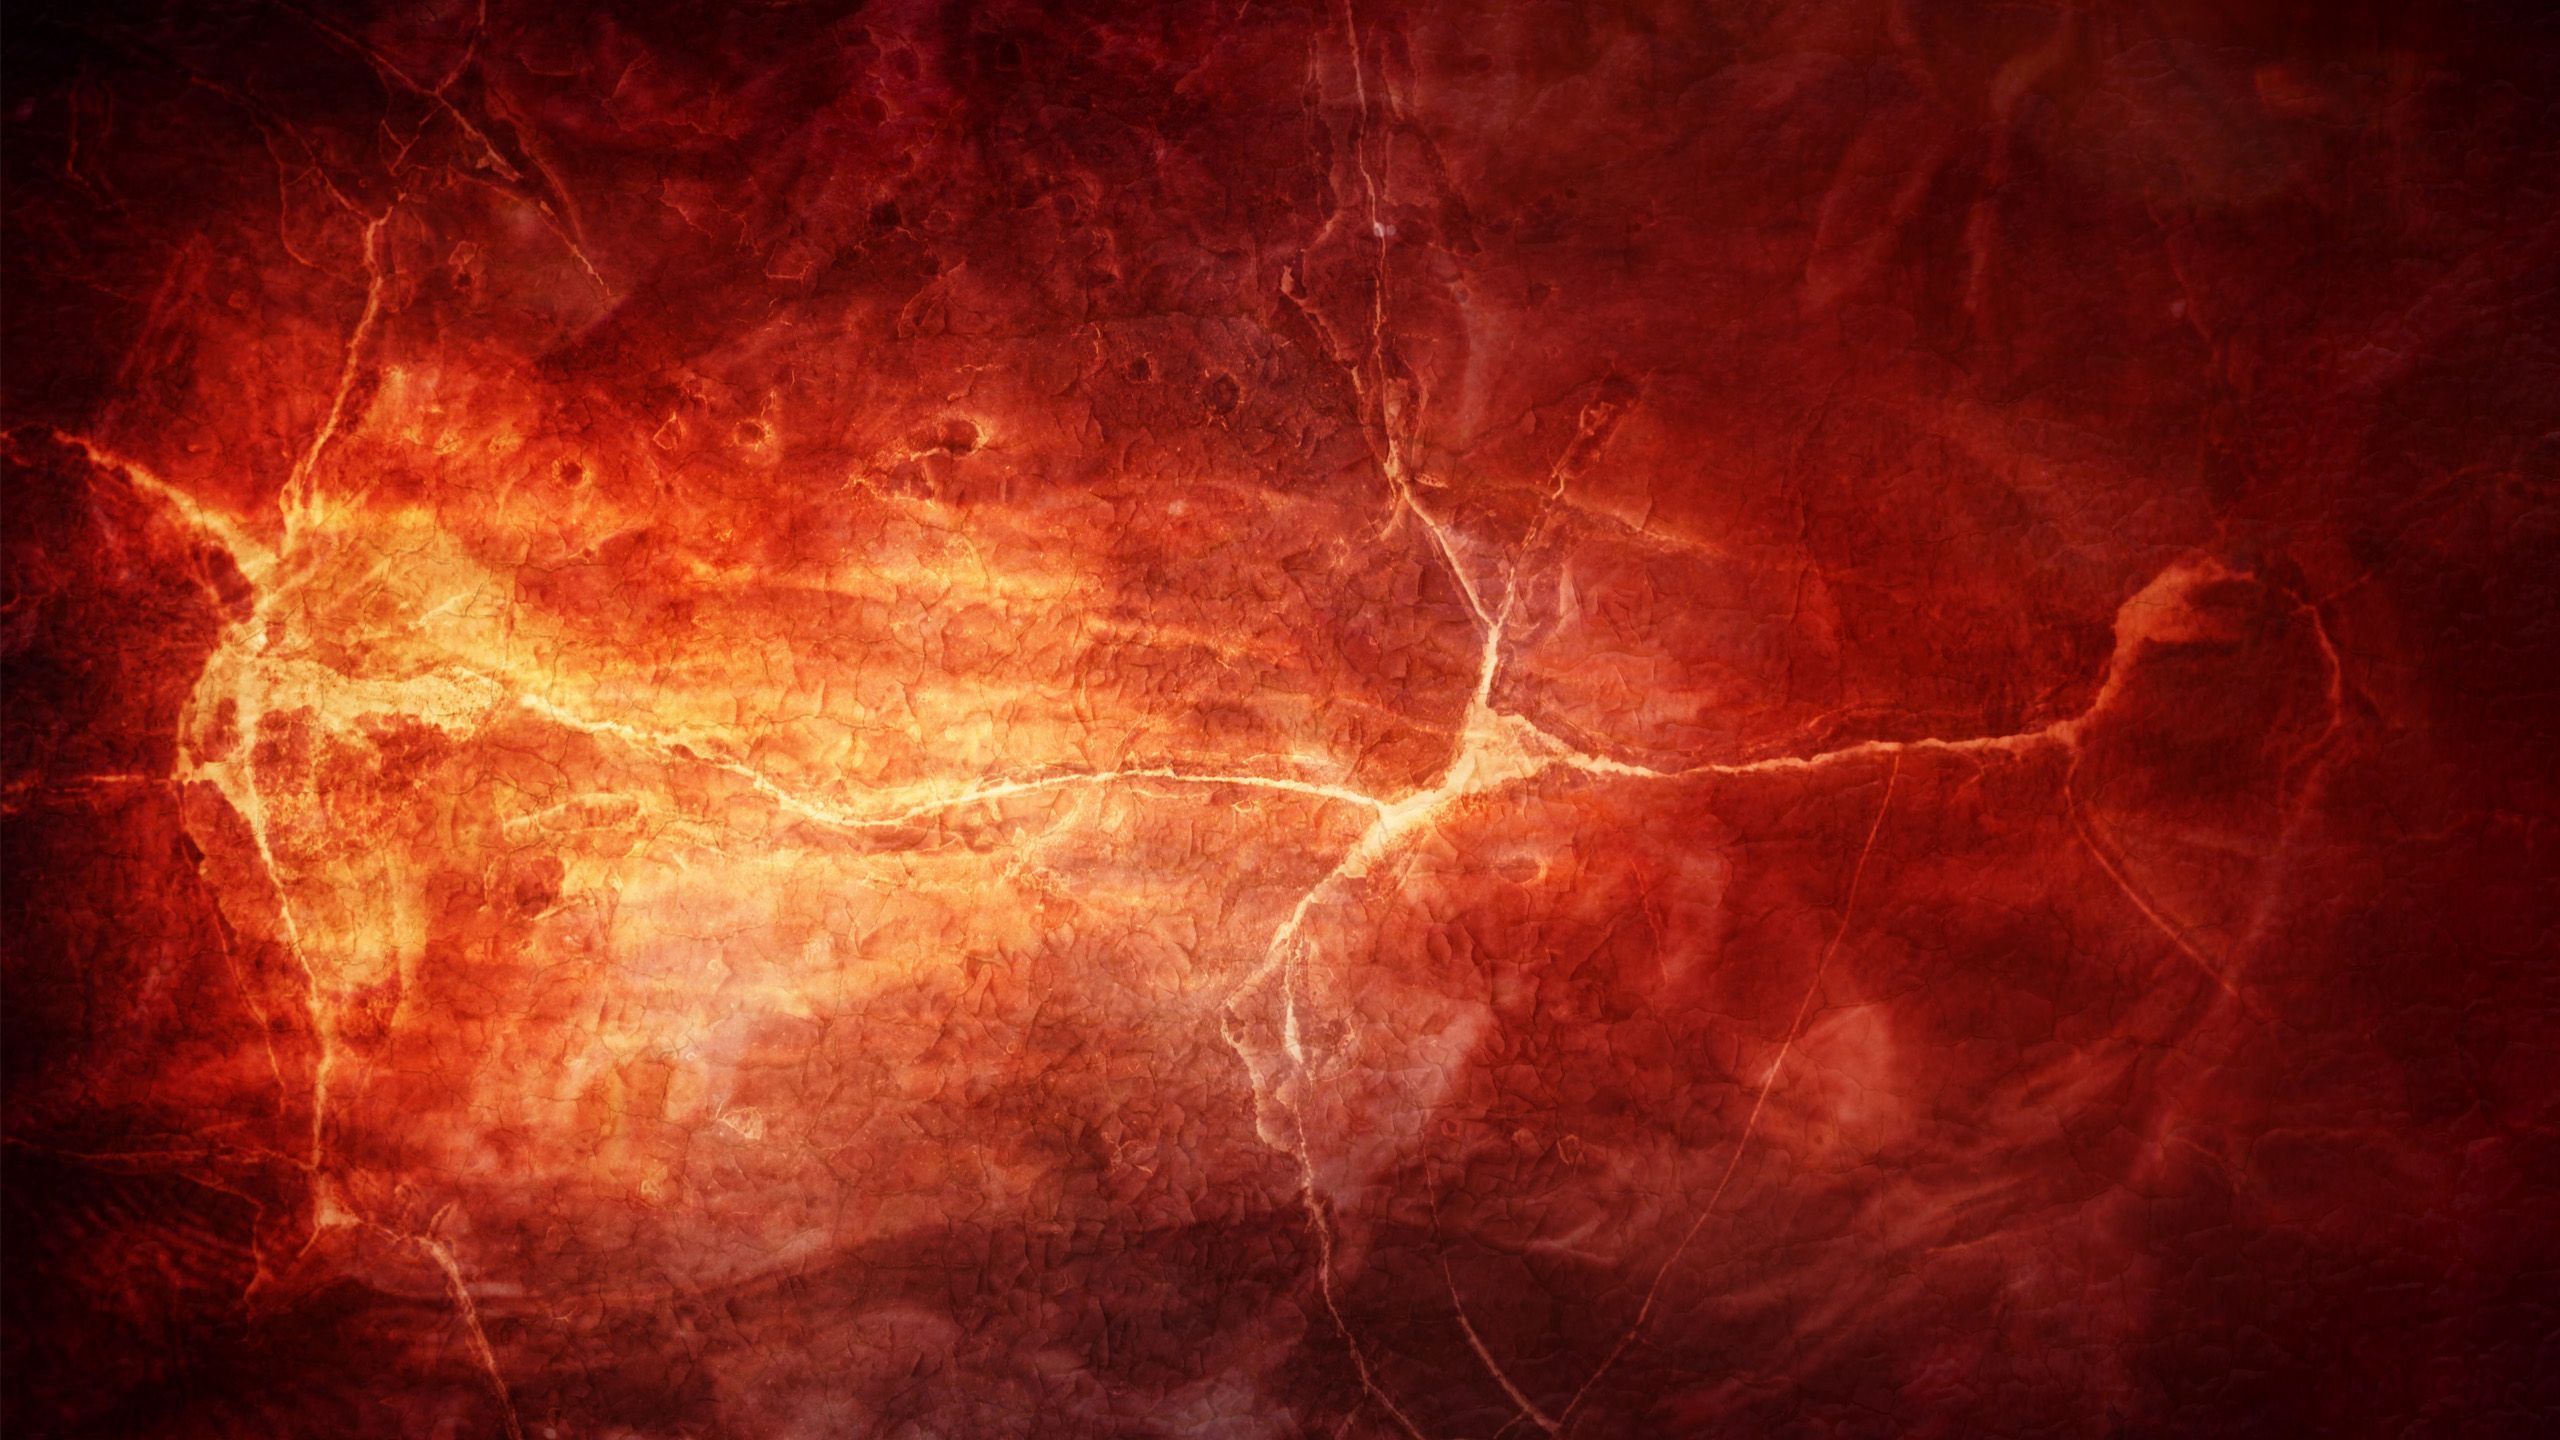 Lava texture bing images - Lava Texture Hd Wallpaper Wallpapers Pinterest Lava And Hd Wallpaper